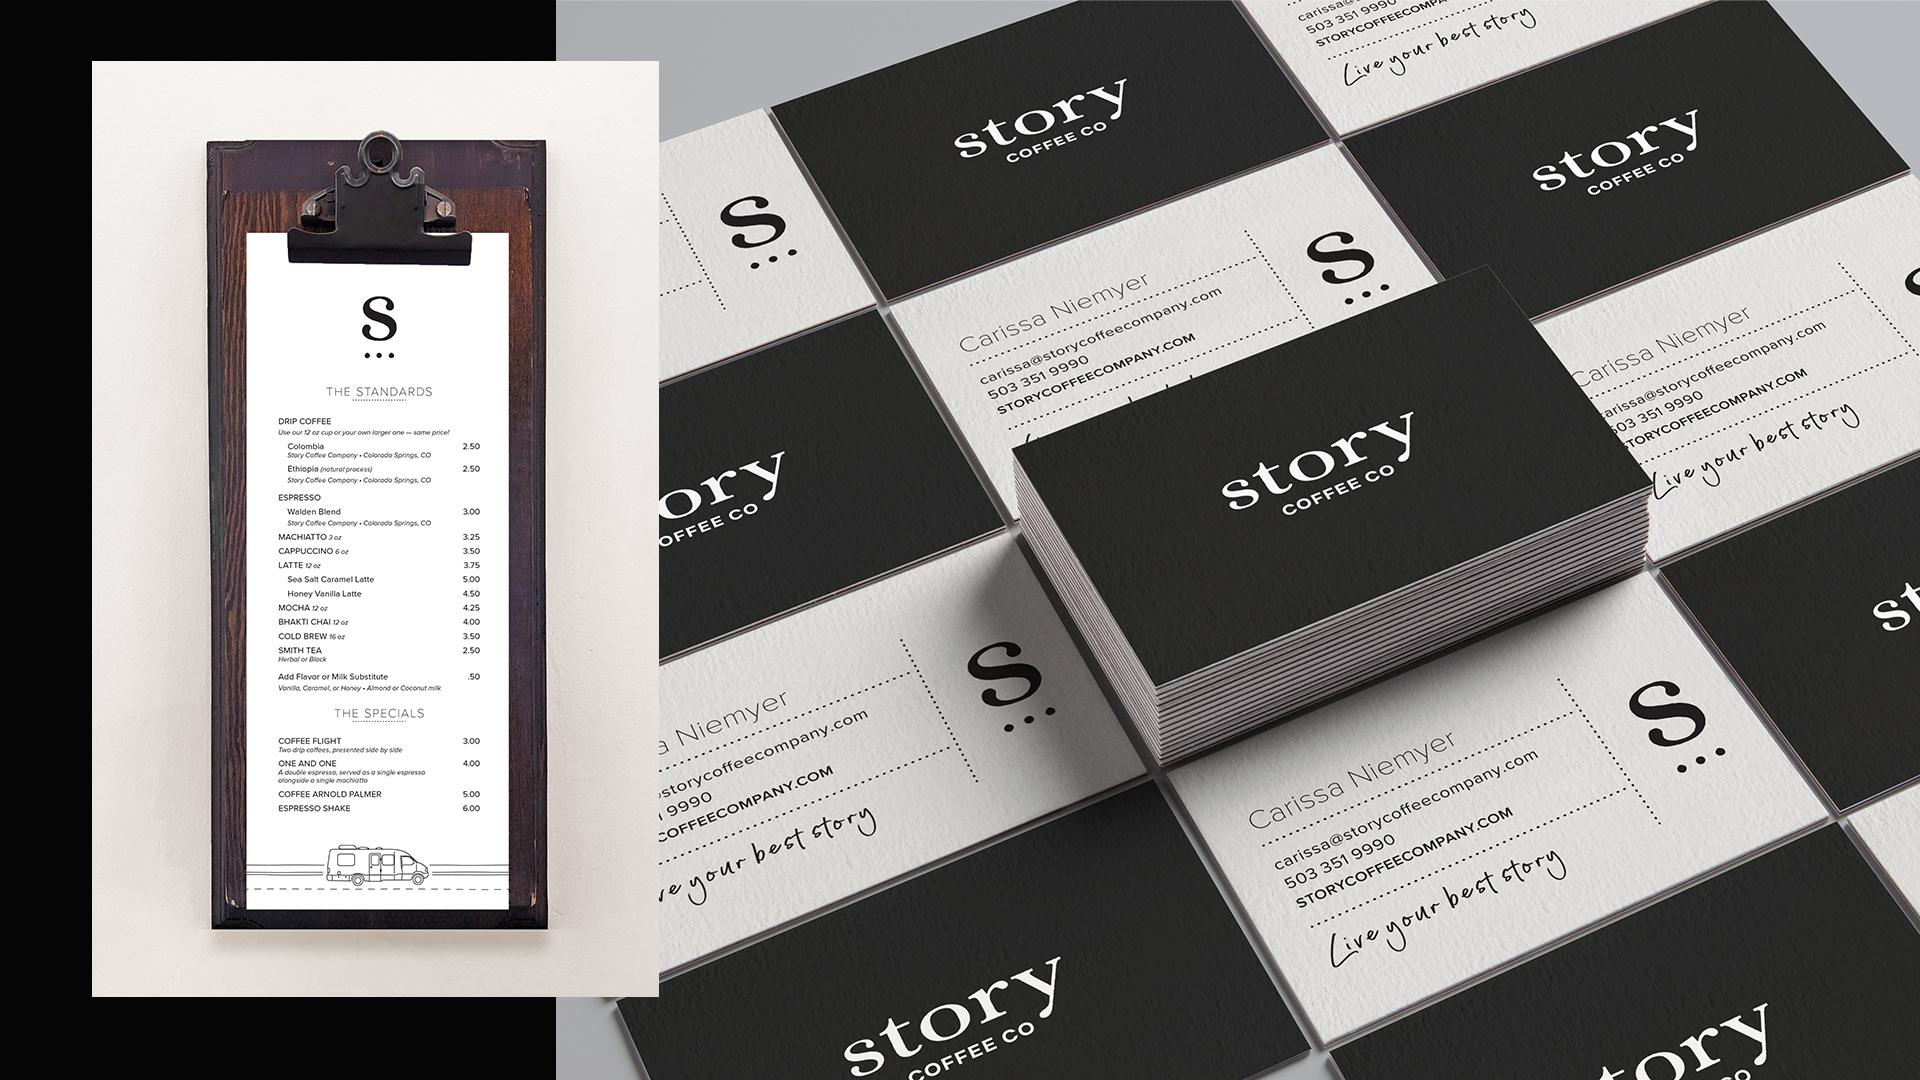 story-coffee-co-casestudy-7.jpg